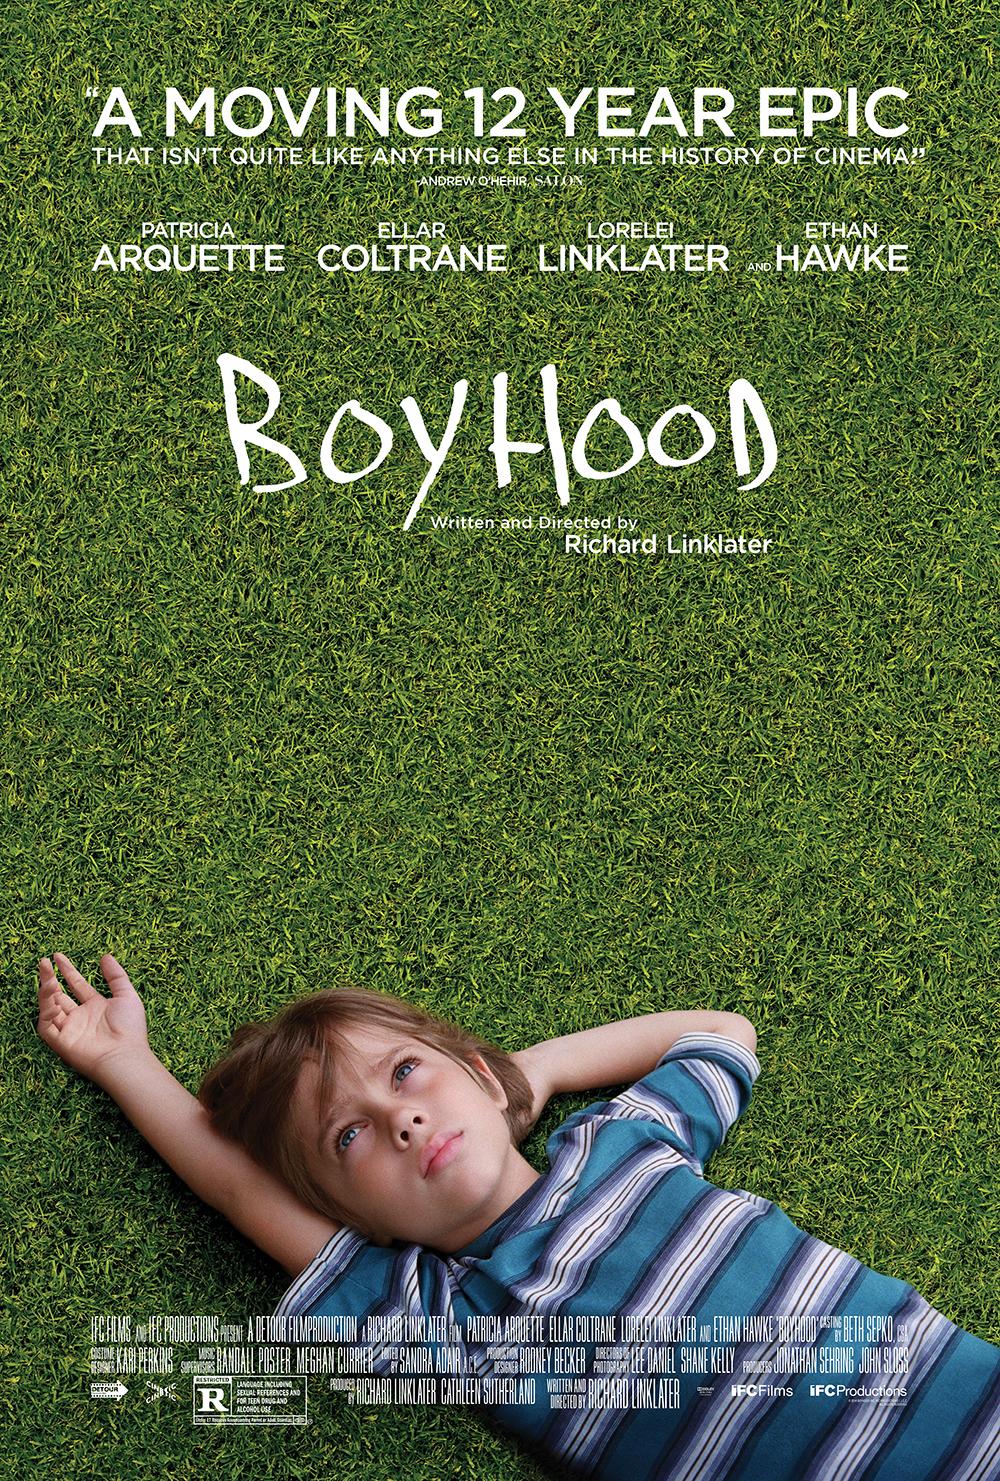 BoyHood (2014) Movie 720p BluRay 1.2GB With Bangla Subtitle